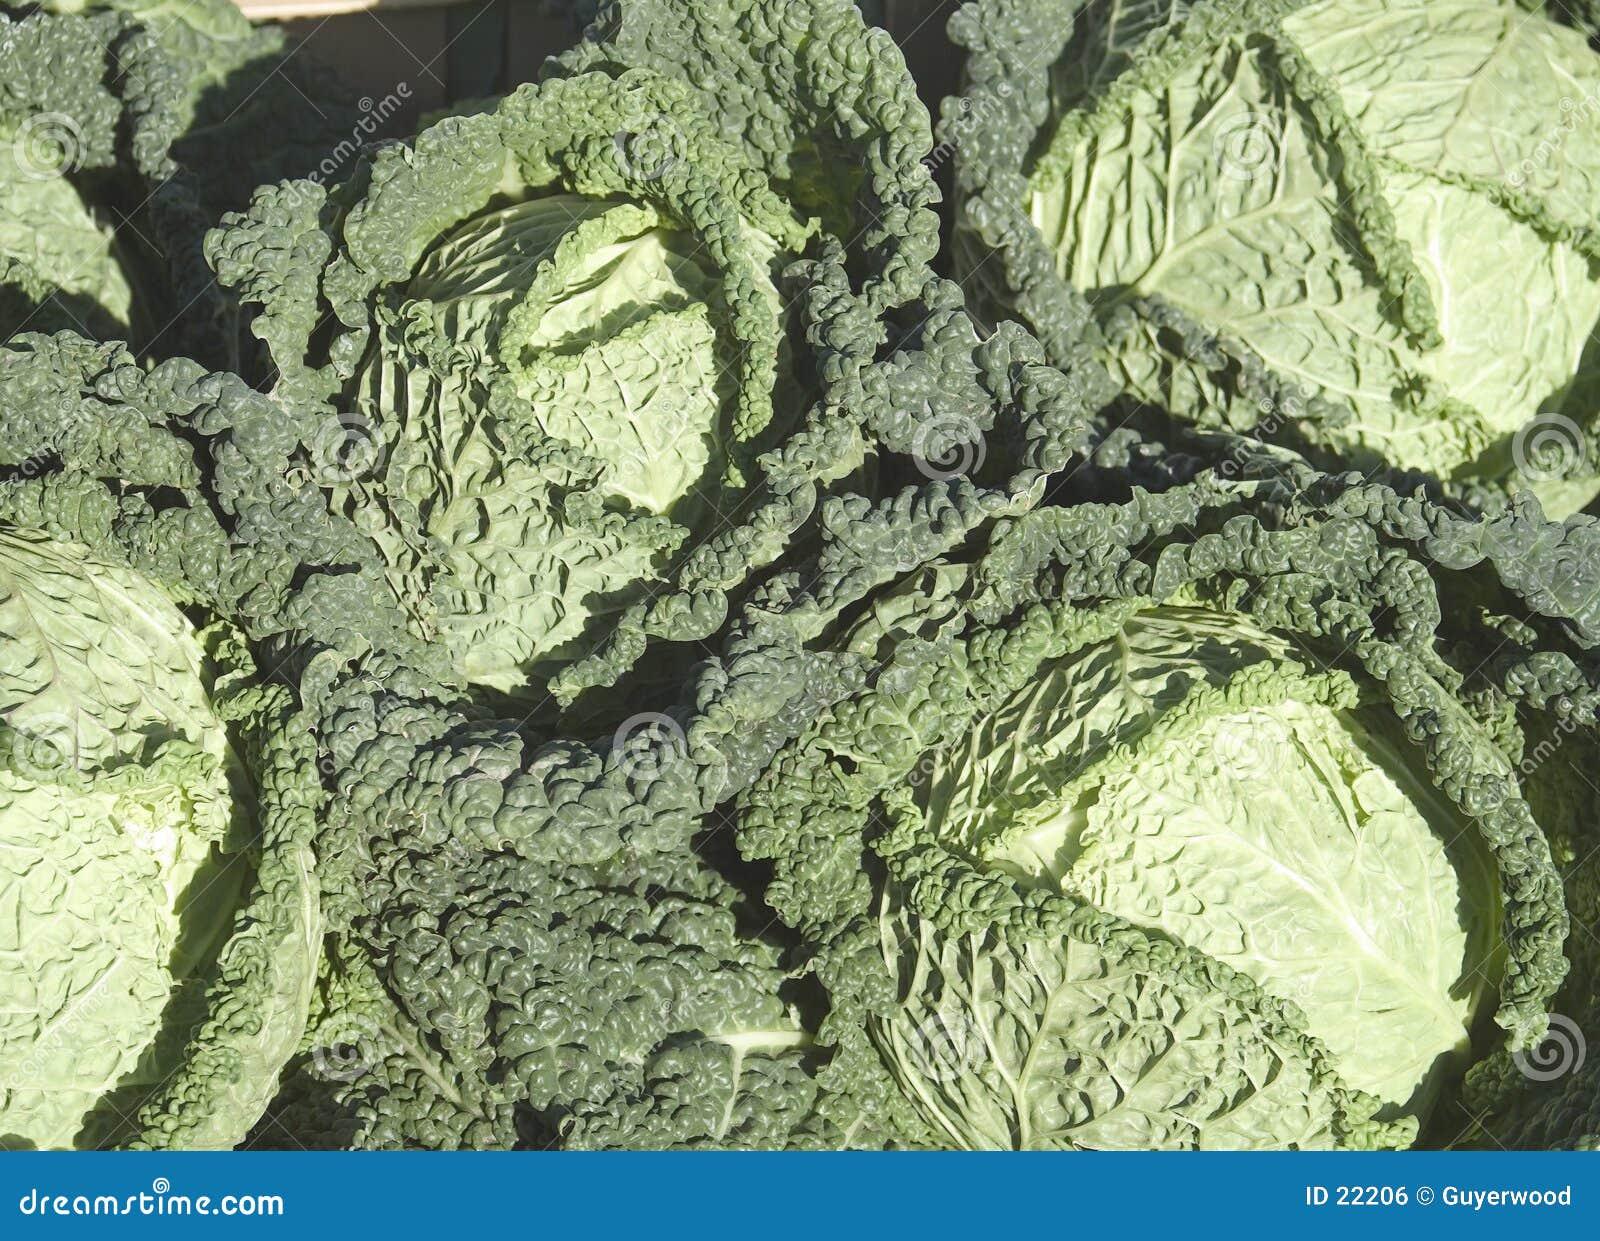 Cabbages (savoy type)